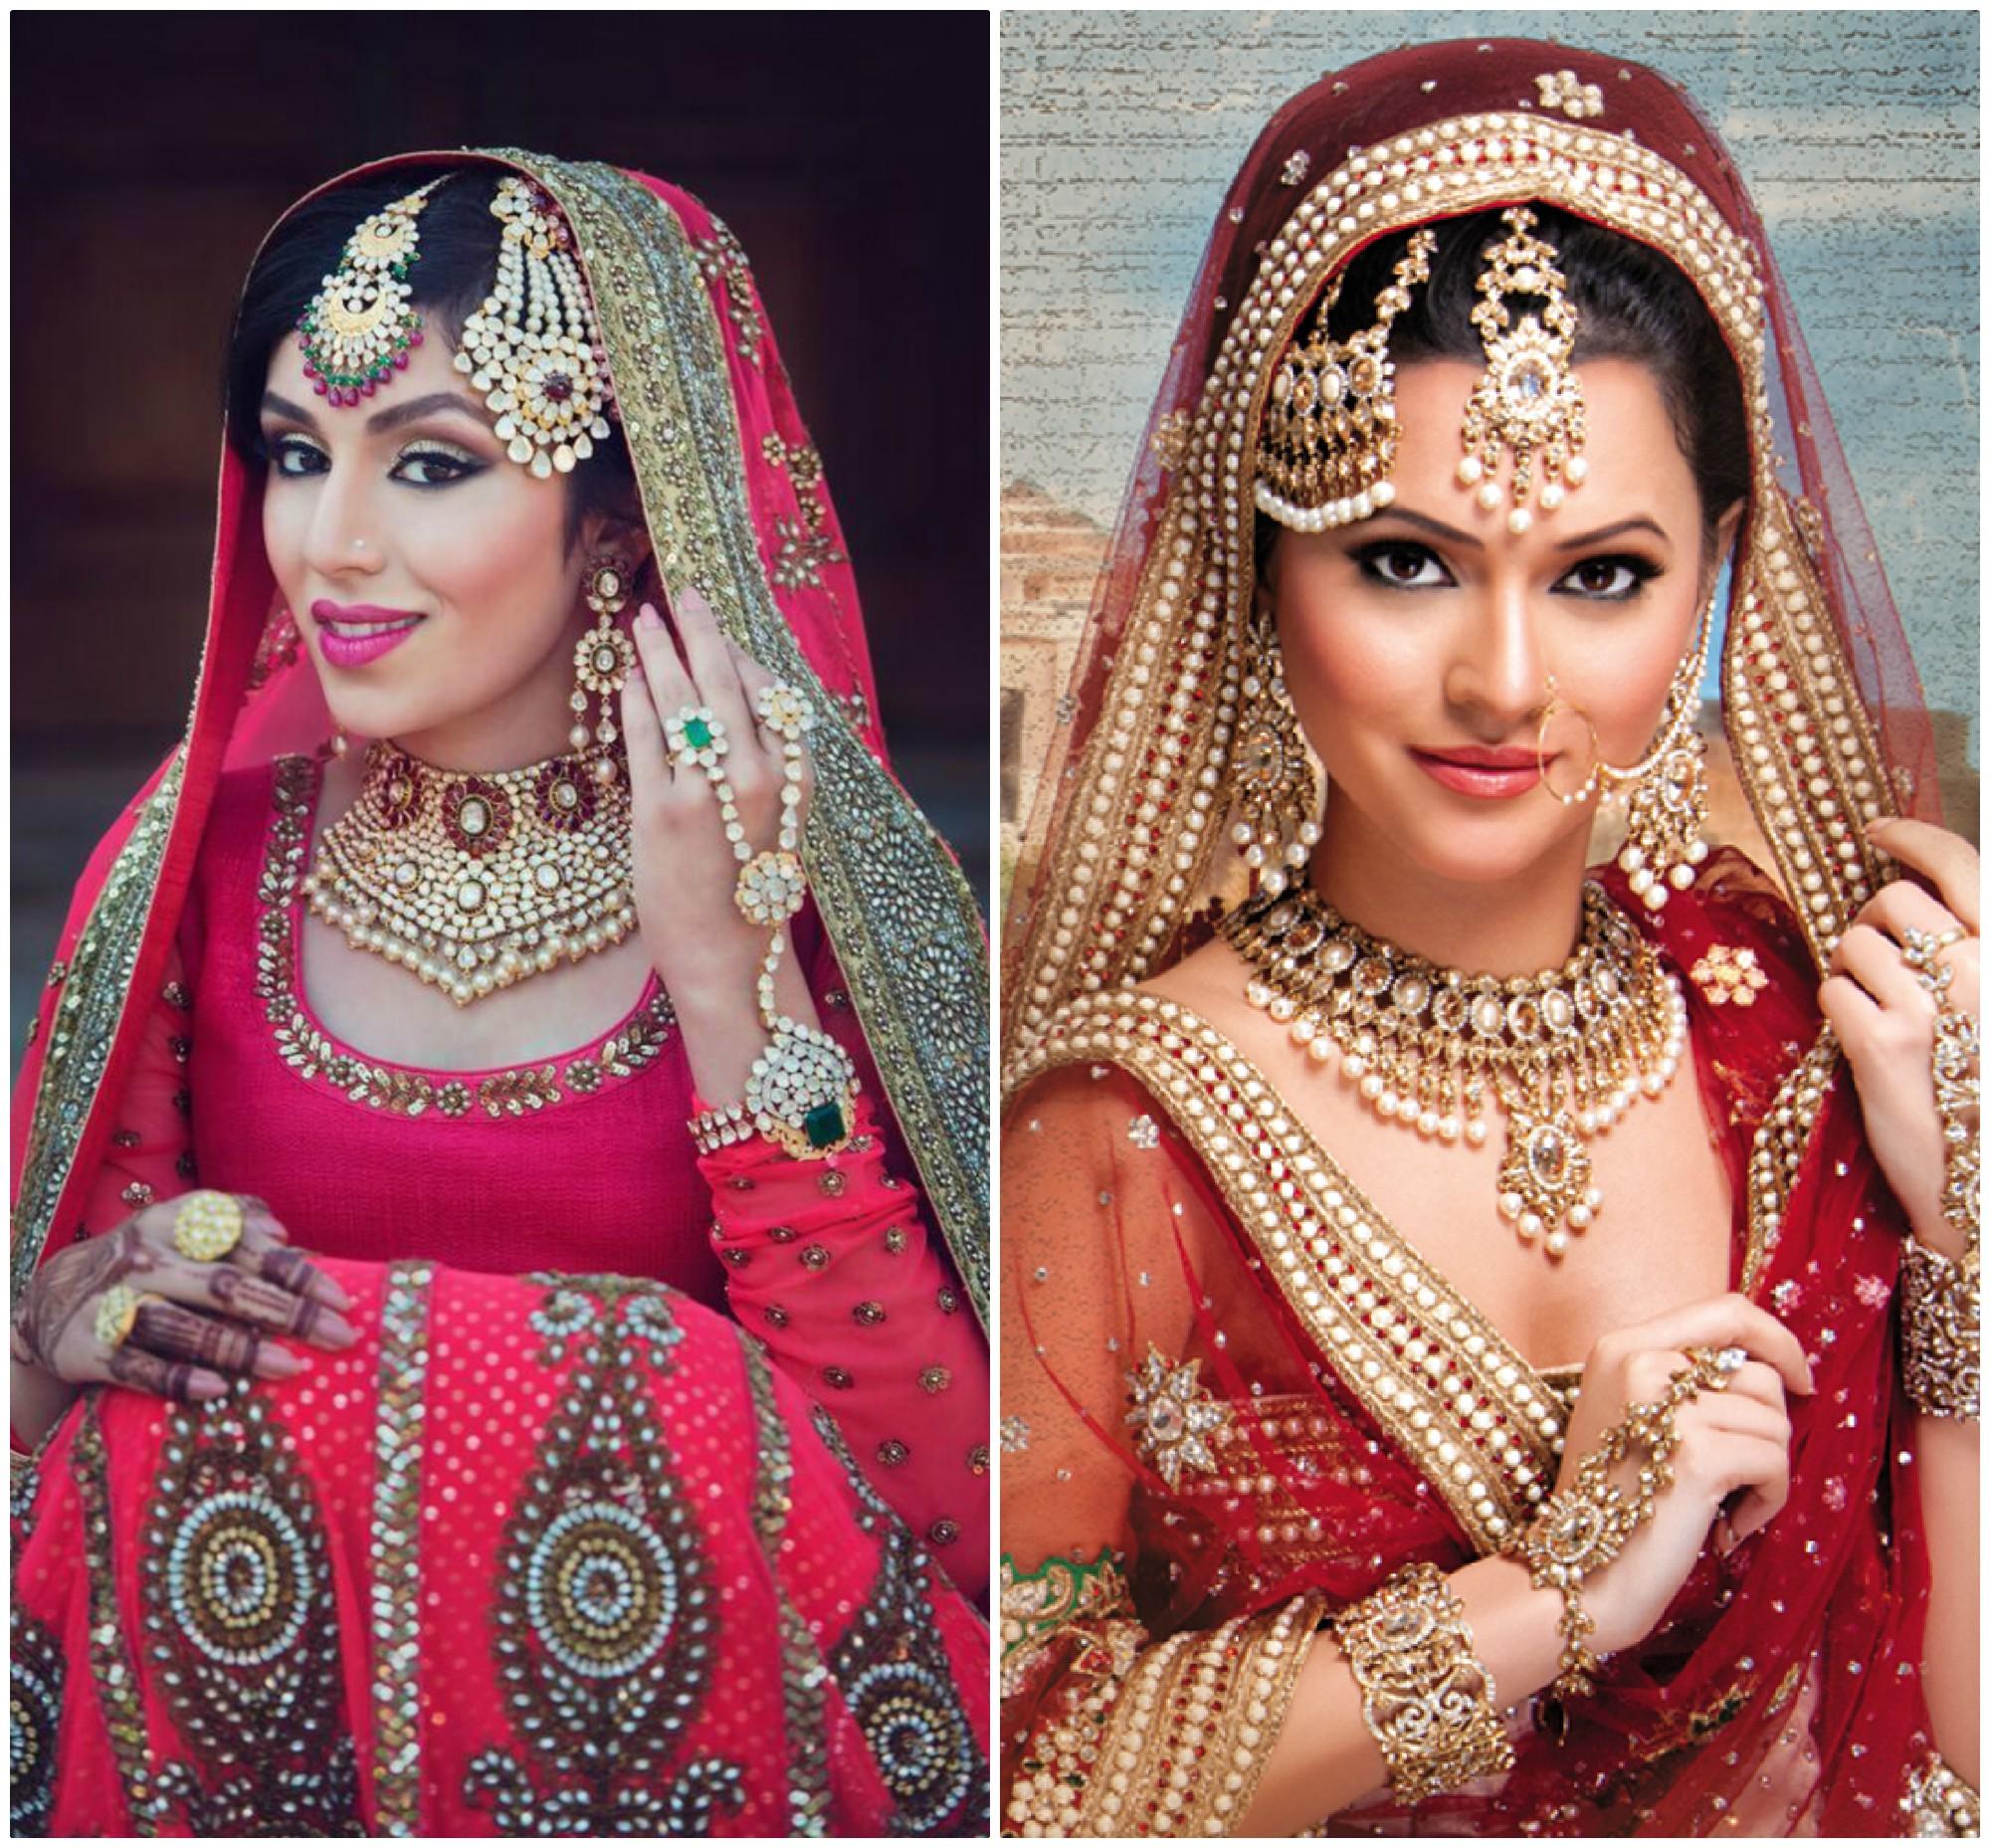 PunjabKesari, ब्राइडल लुक फोटो,रजवाड़ा ब्राइडल लुक फोटो, मुगल ब्राइडल लुक